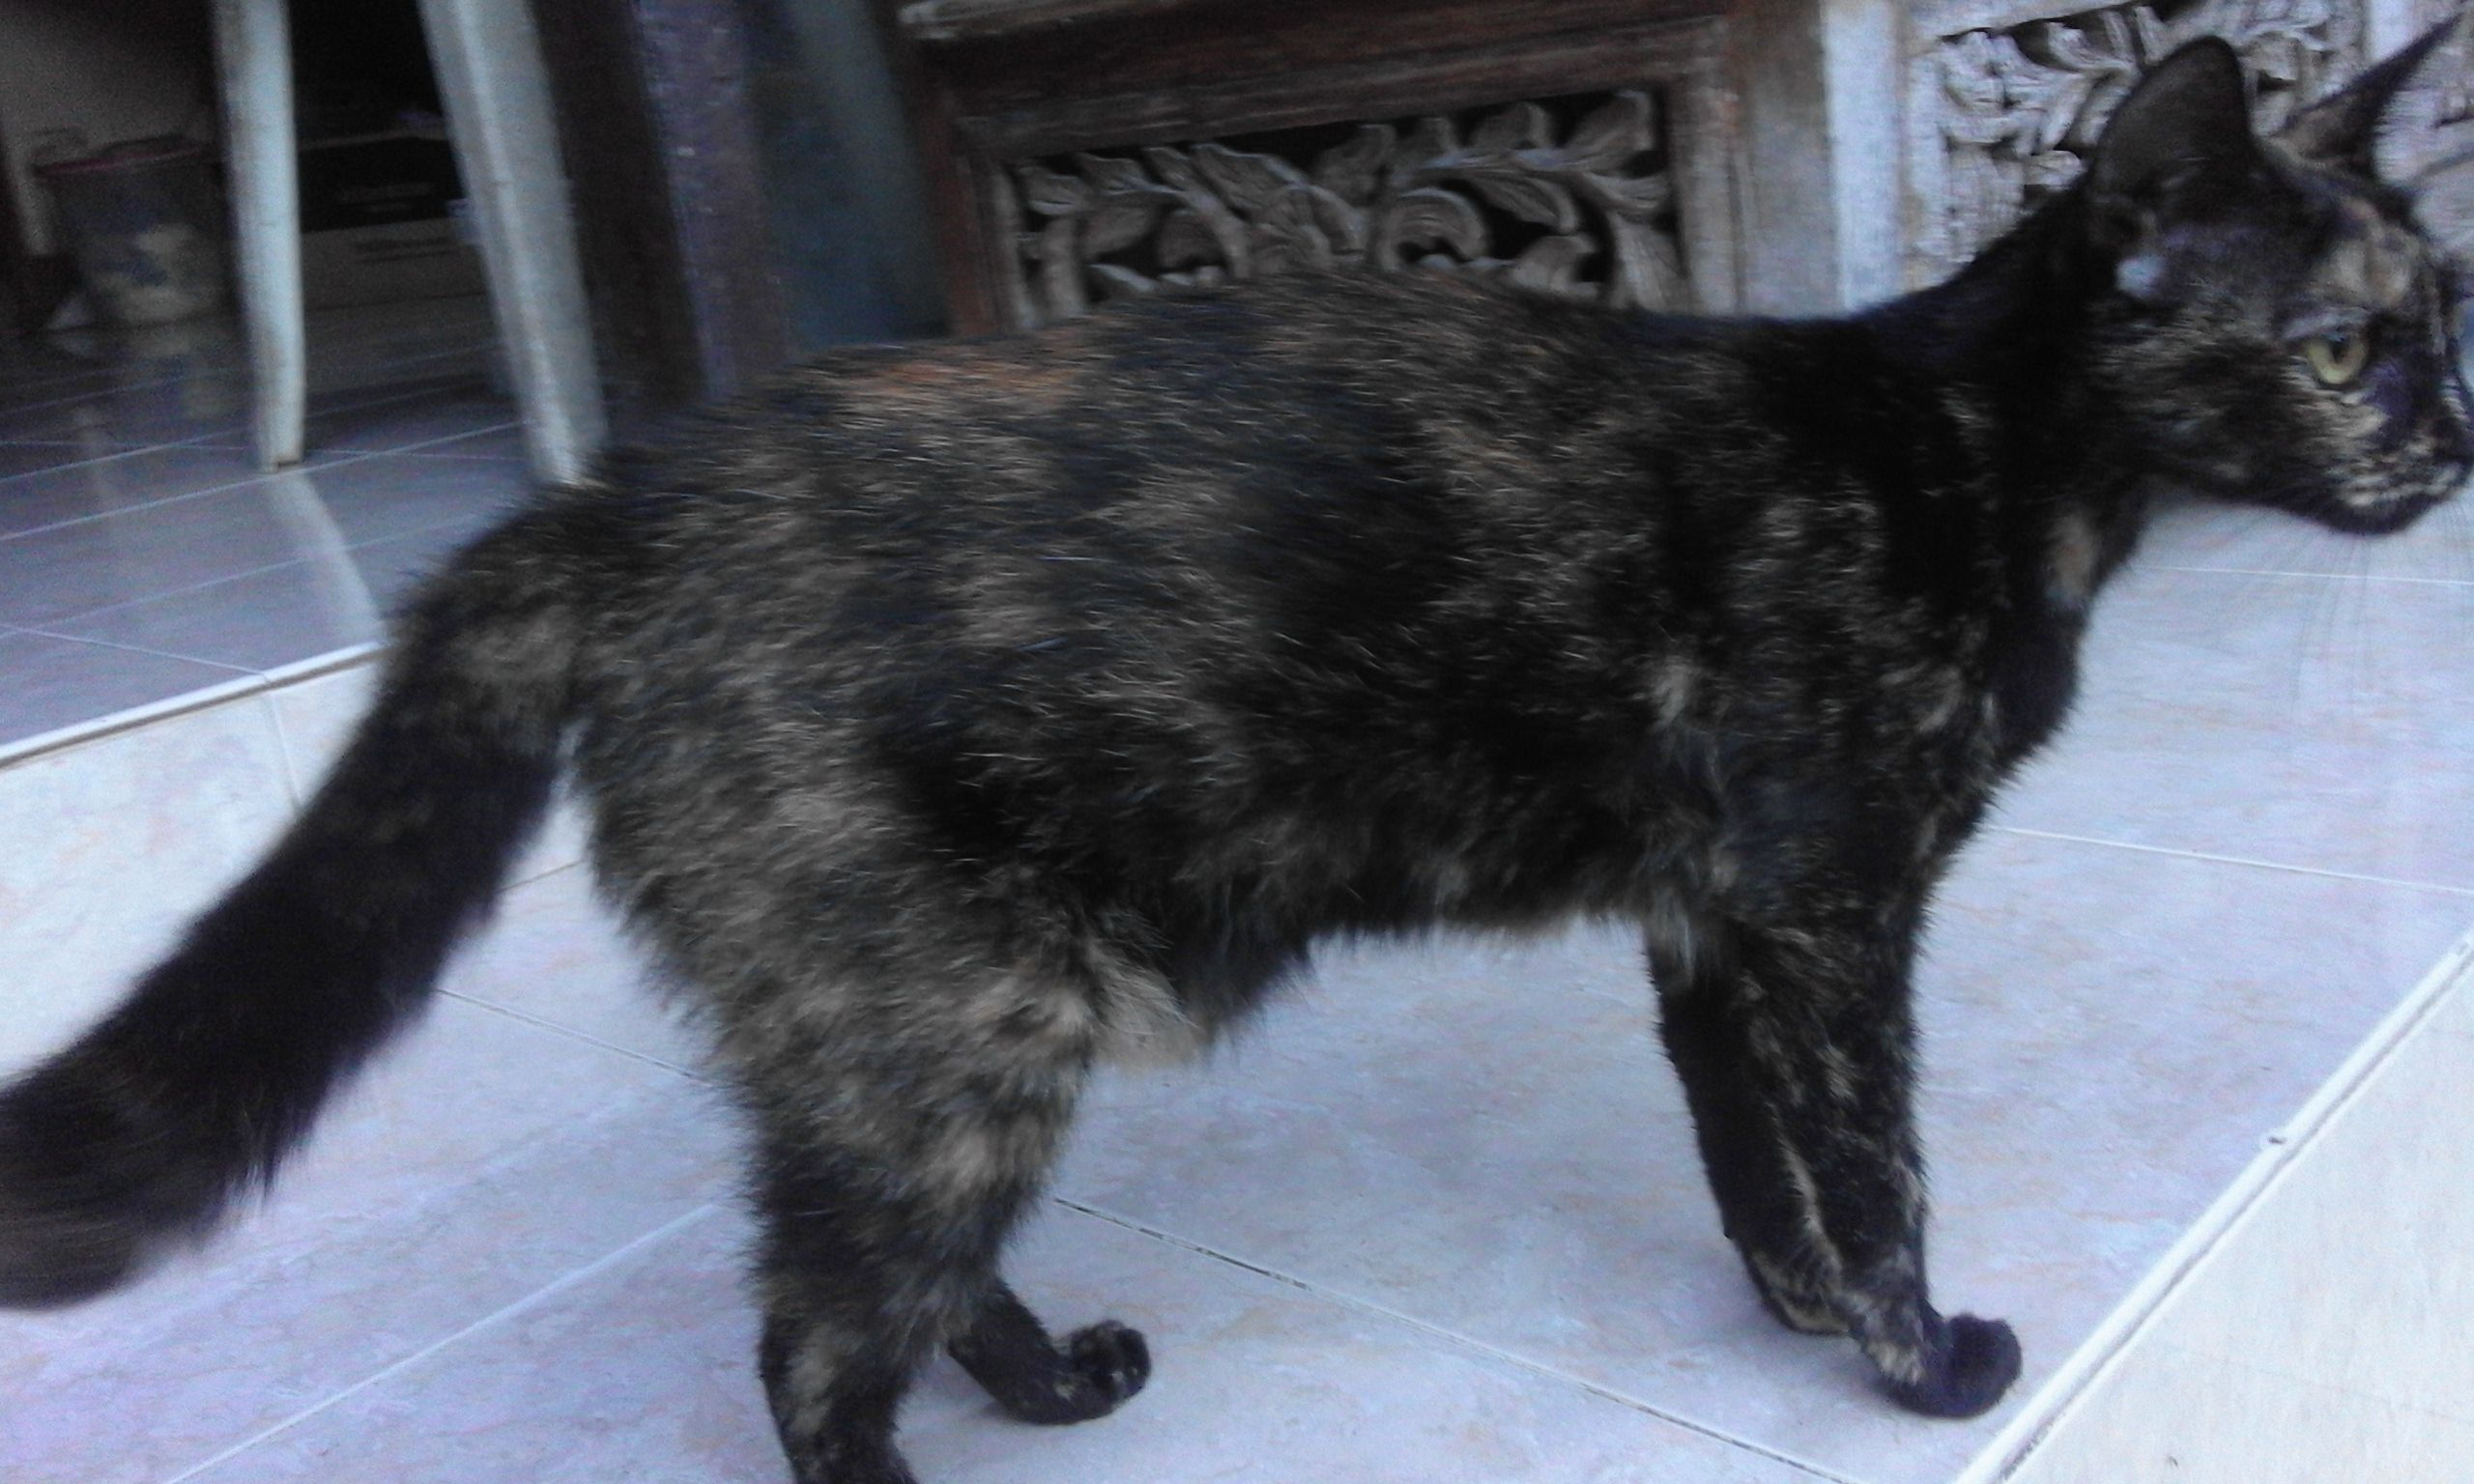 Nama Kucing Jantan Dan Betina Yang Bagus Lucu Unik Dan Keren Kucing Lucu Betina